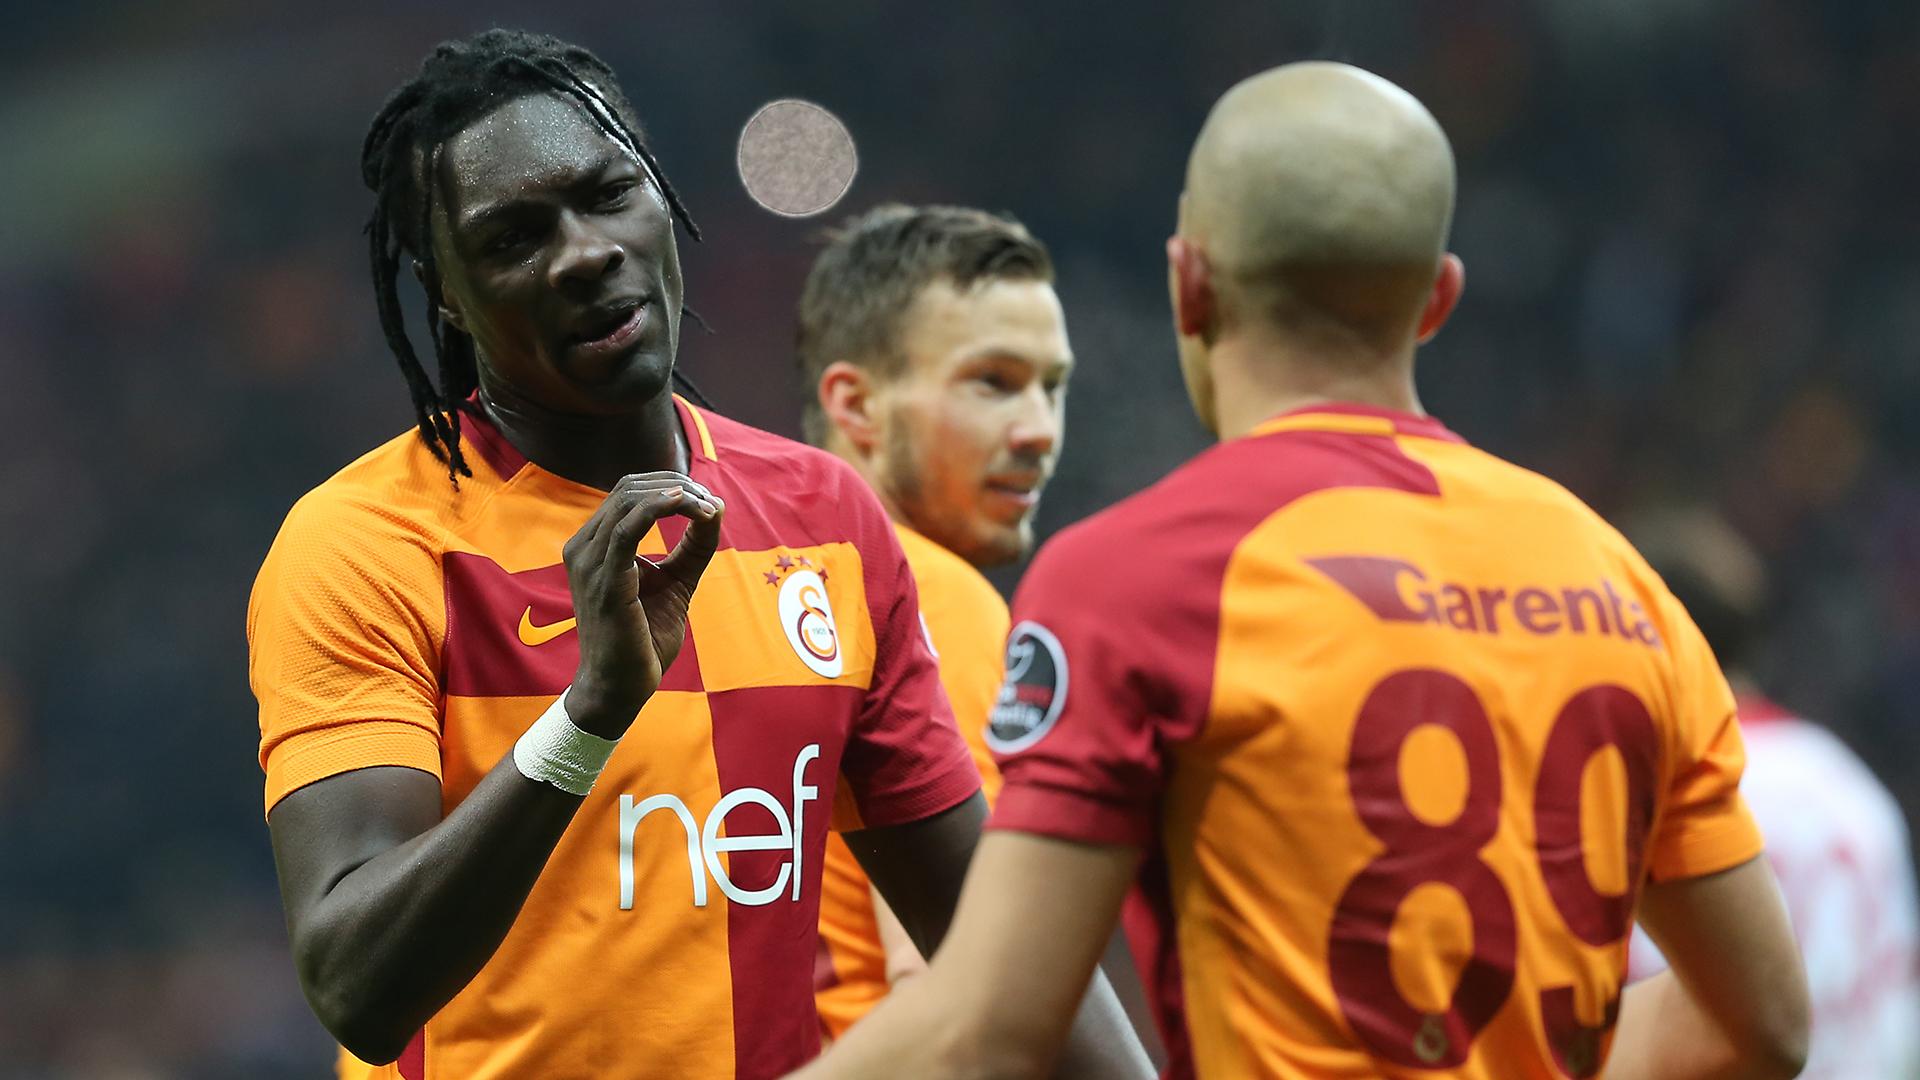 Bafetimbi Gomis Sofiane Feghouli Galatasaray Antalyaspor 02122018